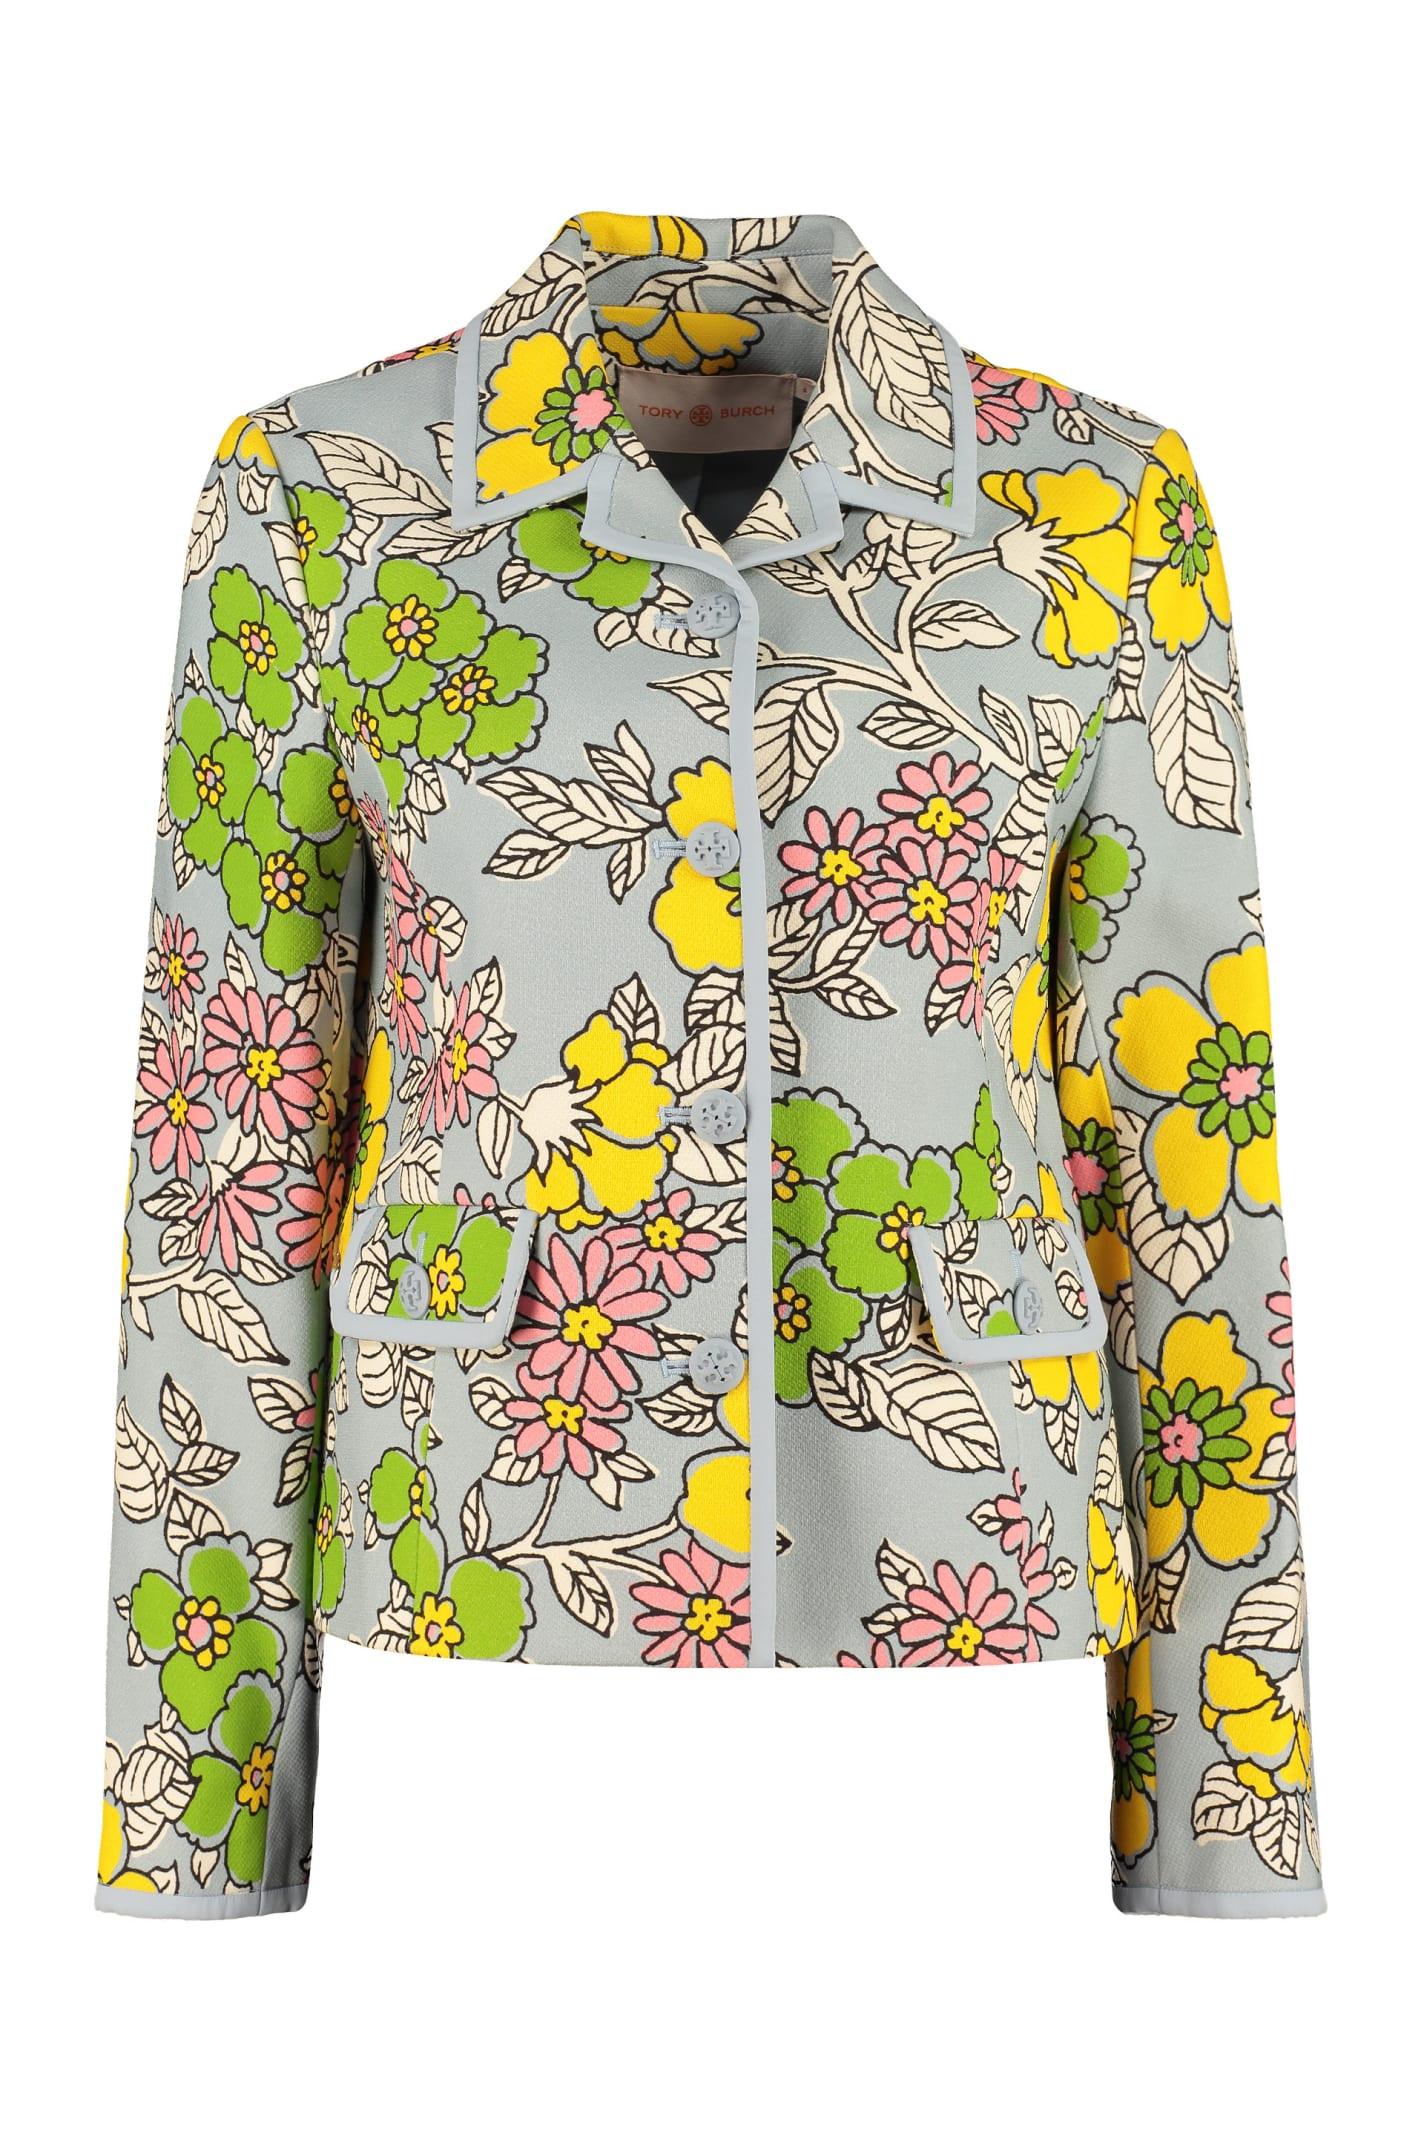 Tory Burch Floral Print Blazer